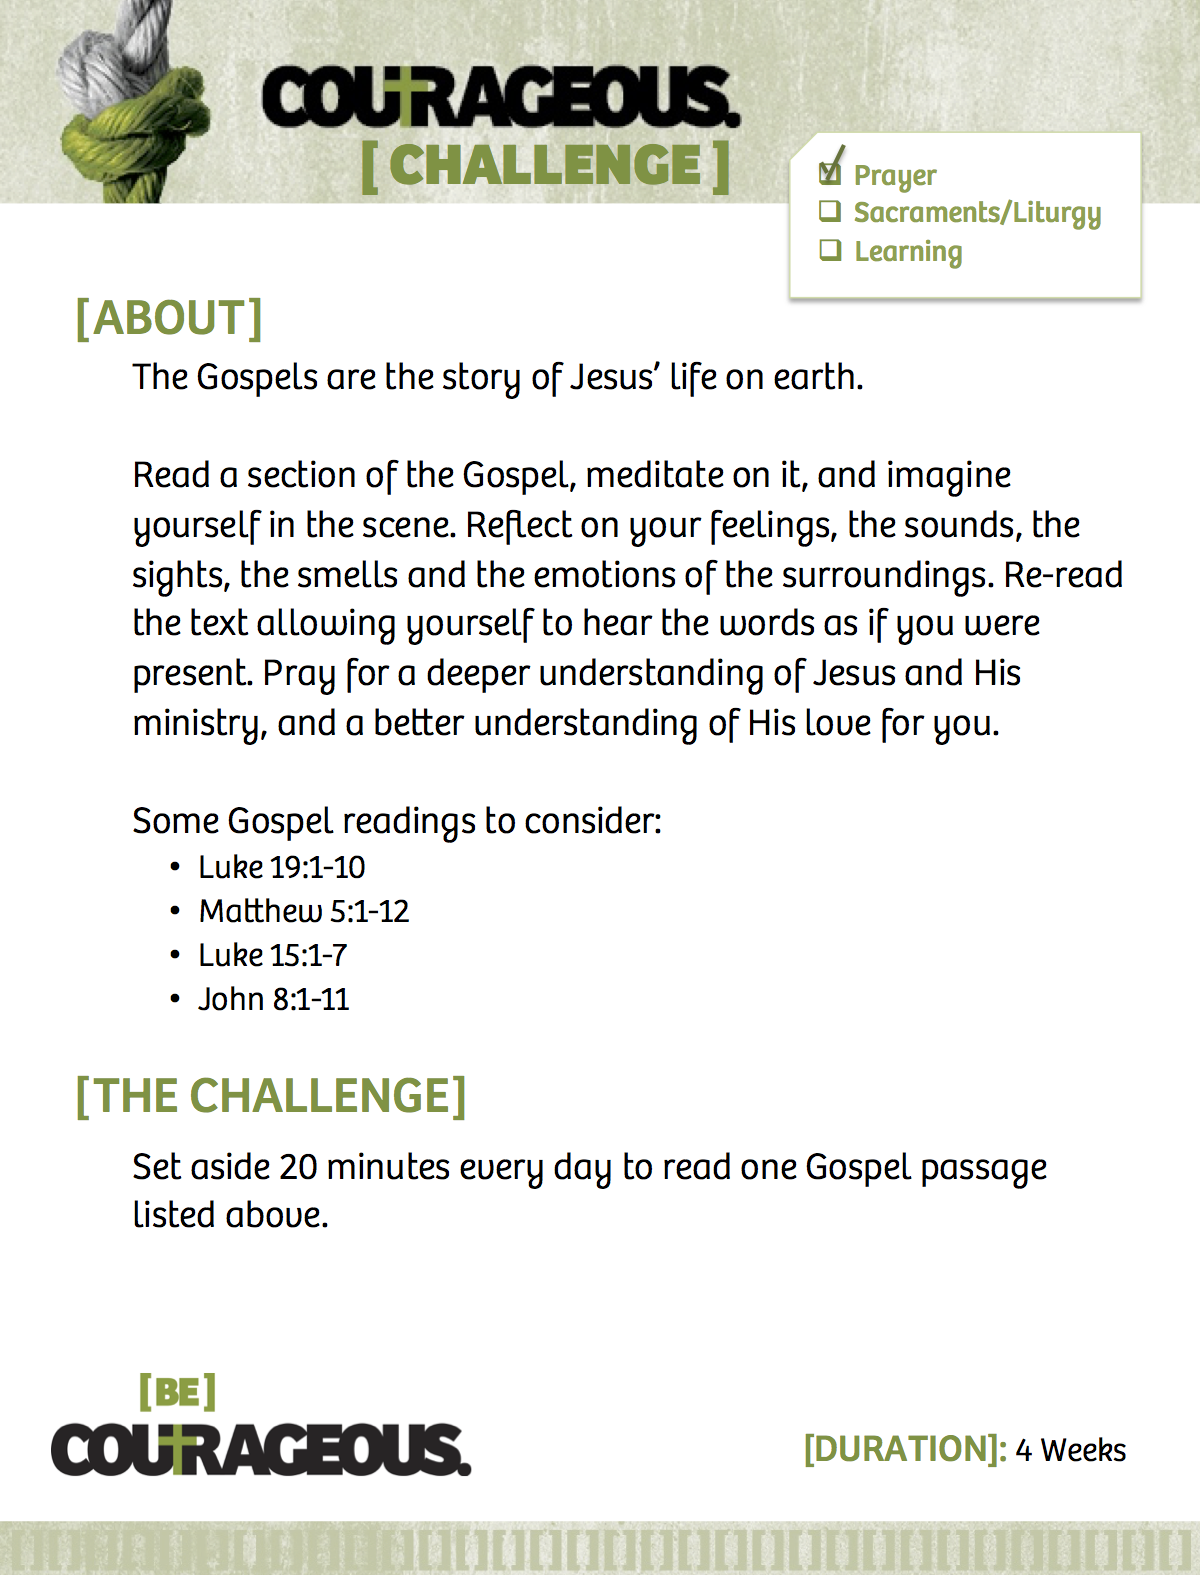 Read the Gospels